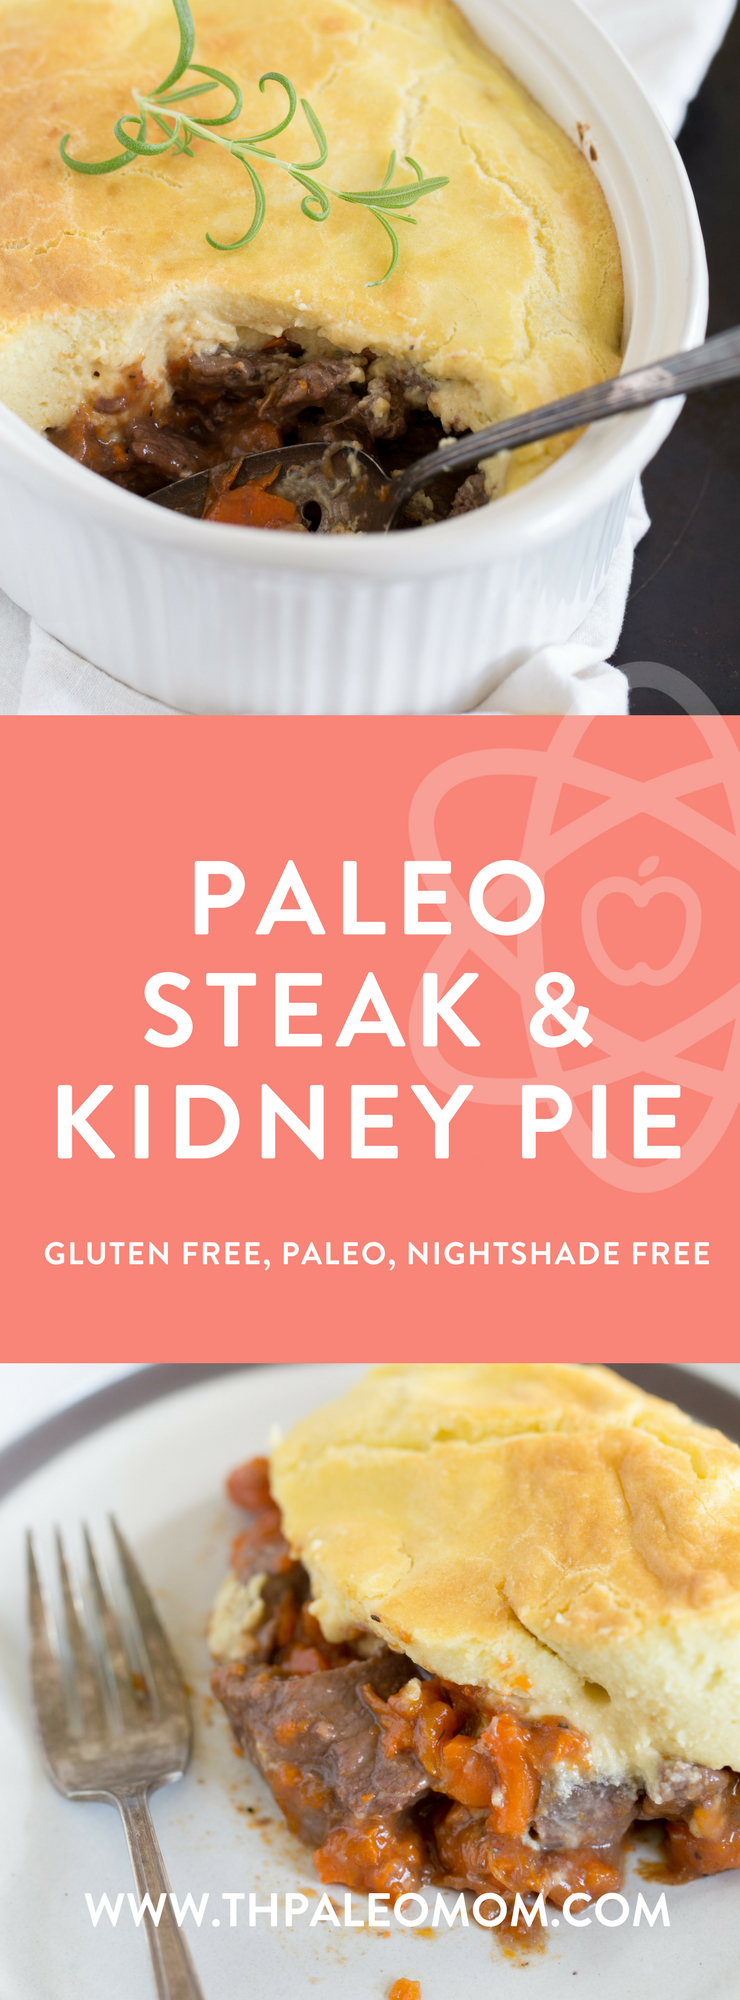 Paleo Steak and Kidney Pie ~ The Paleo Mom | Offal recipes ...